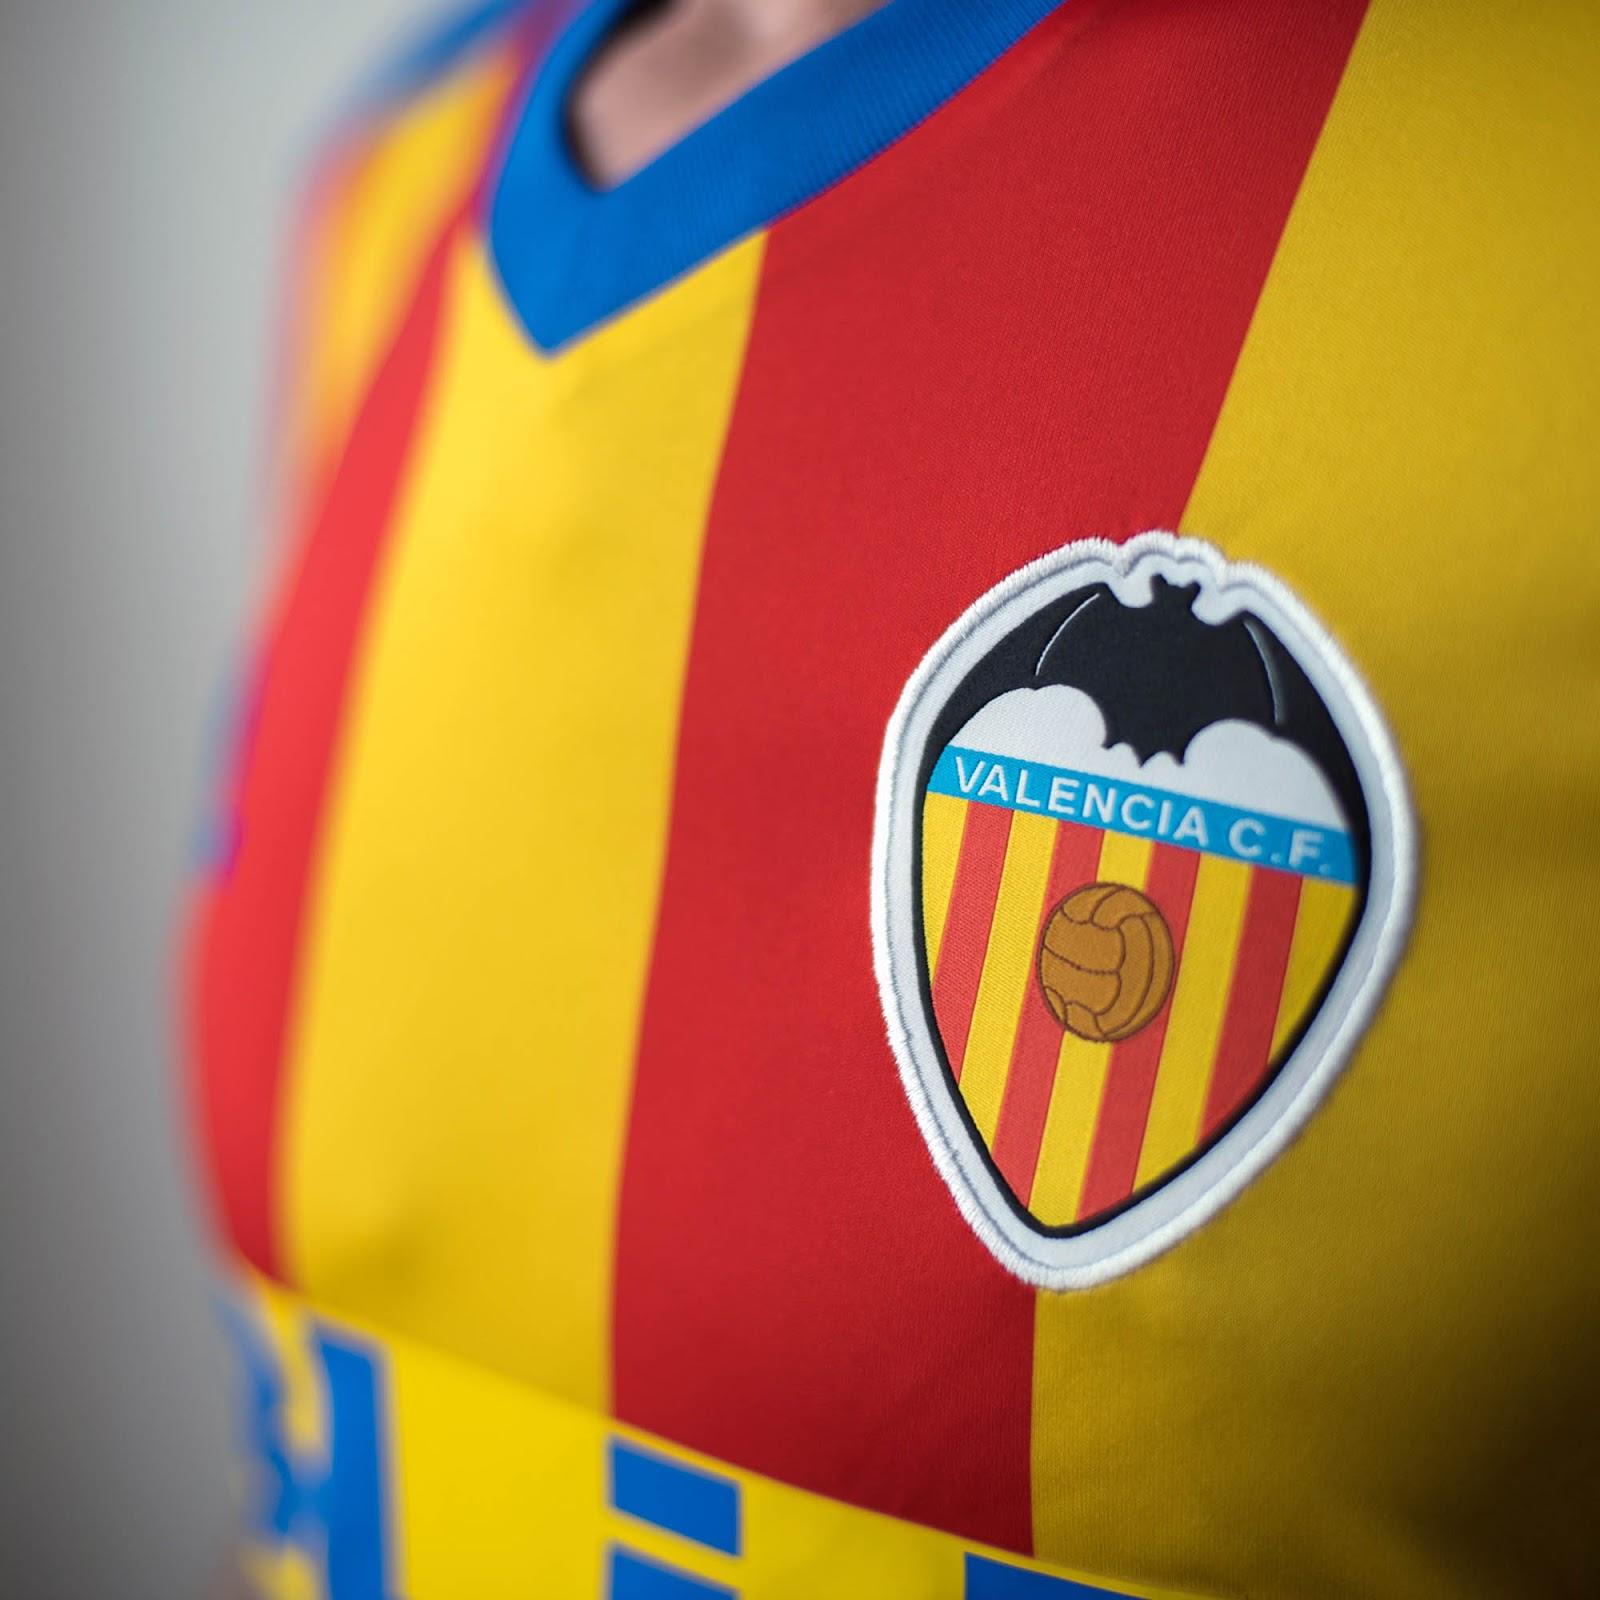 valencia-17-18-away-shirt-crest